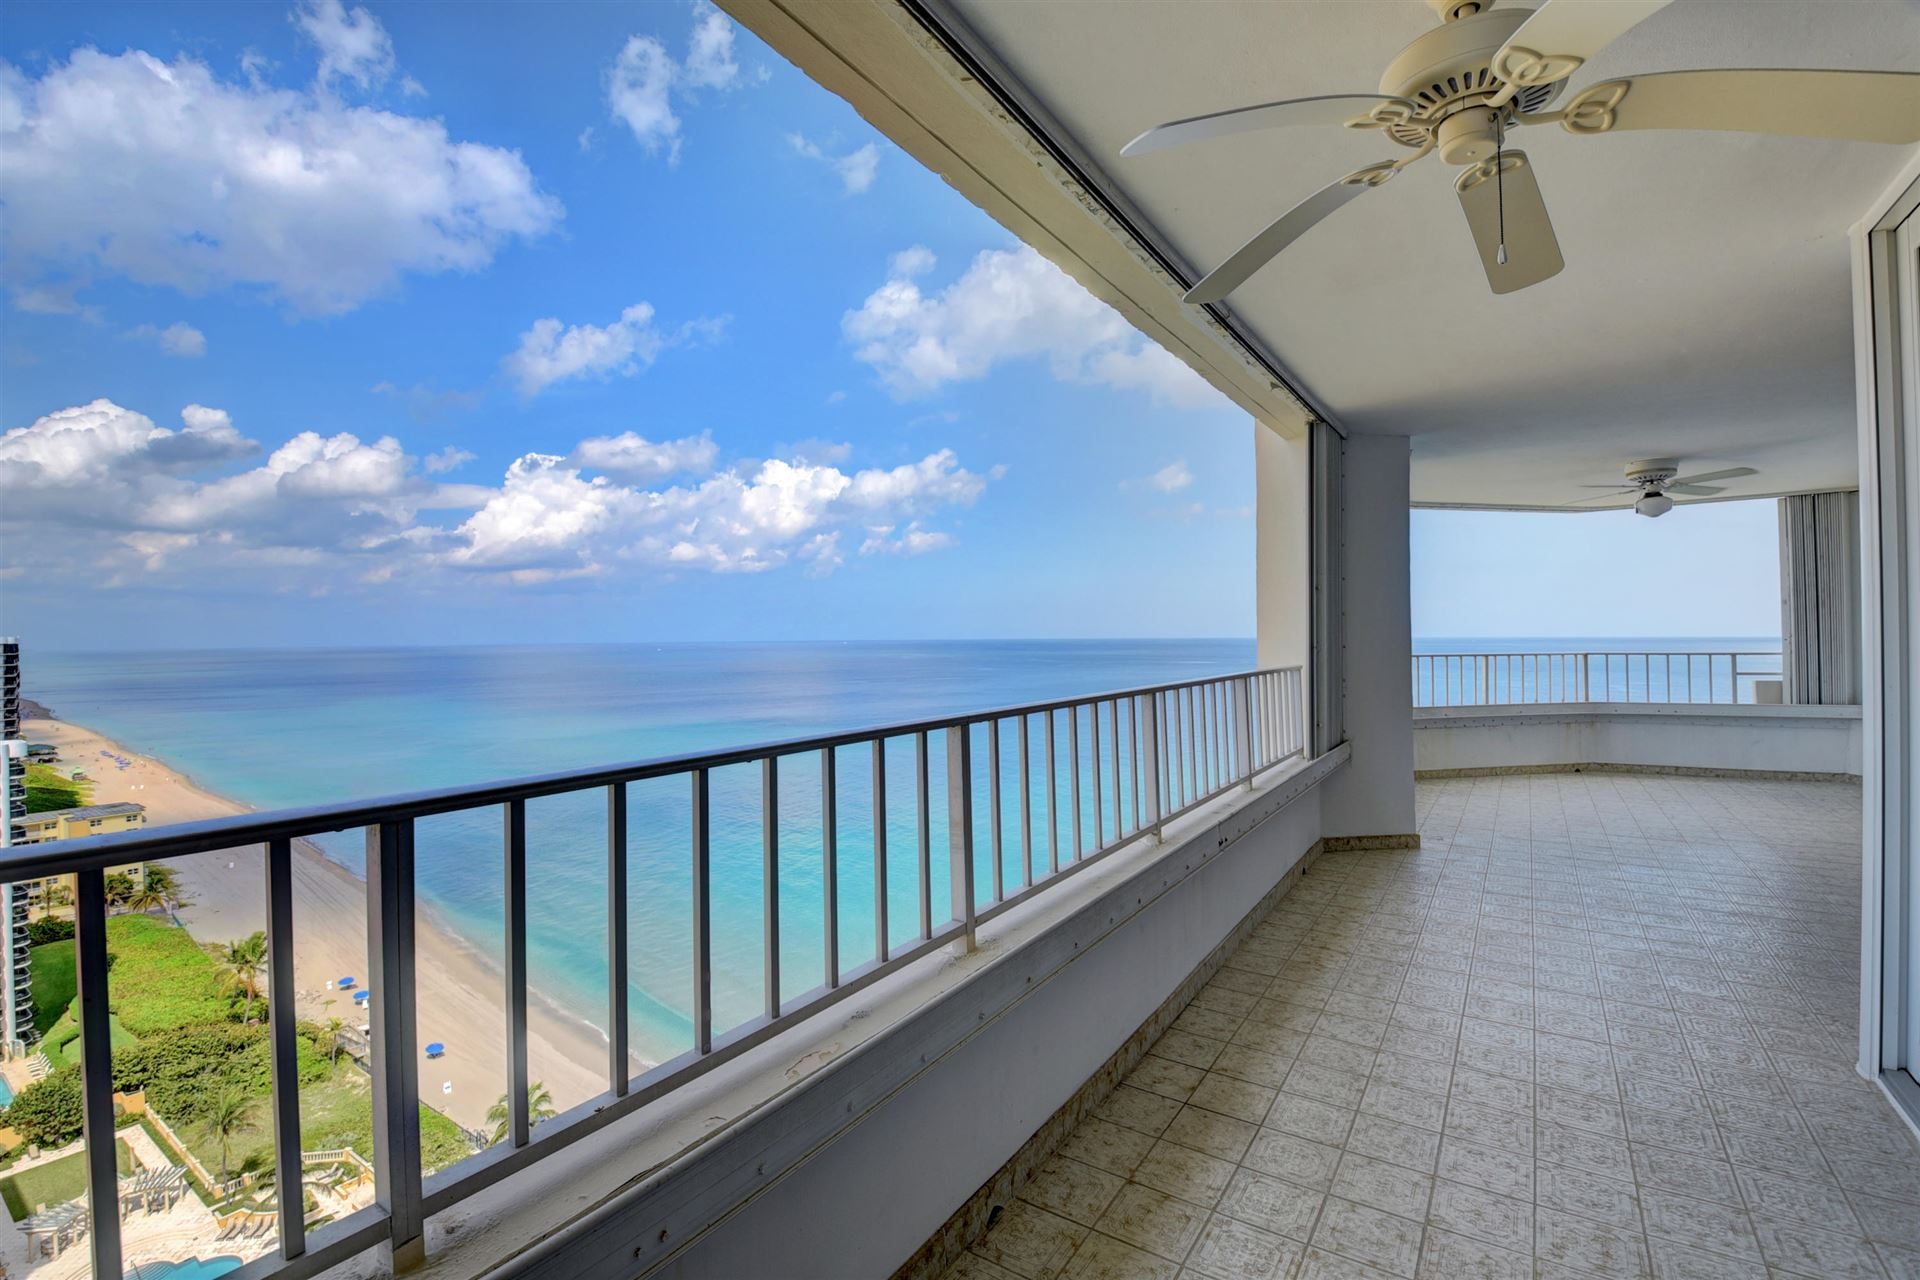 500 S Ocean Boulevard #2101, Boca Raton, FL 33432 - #: RX-10629172